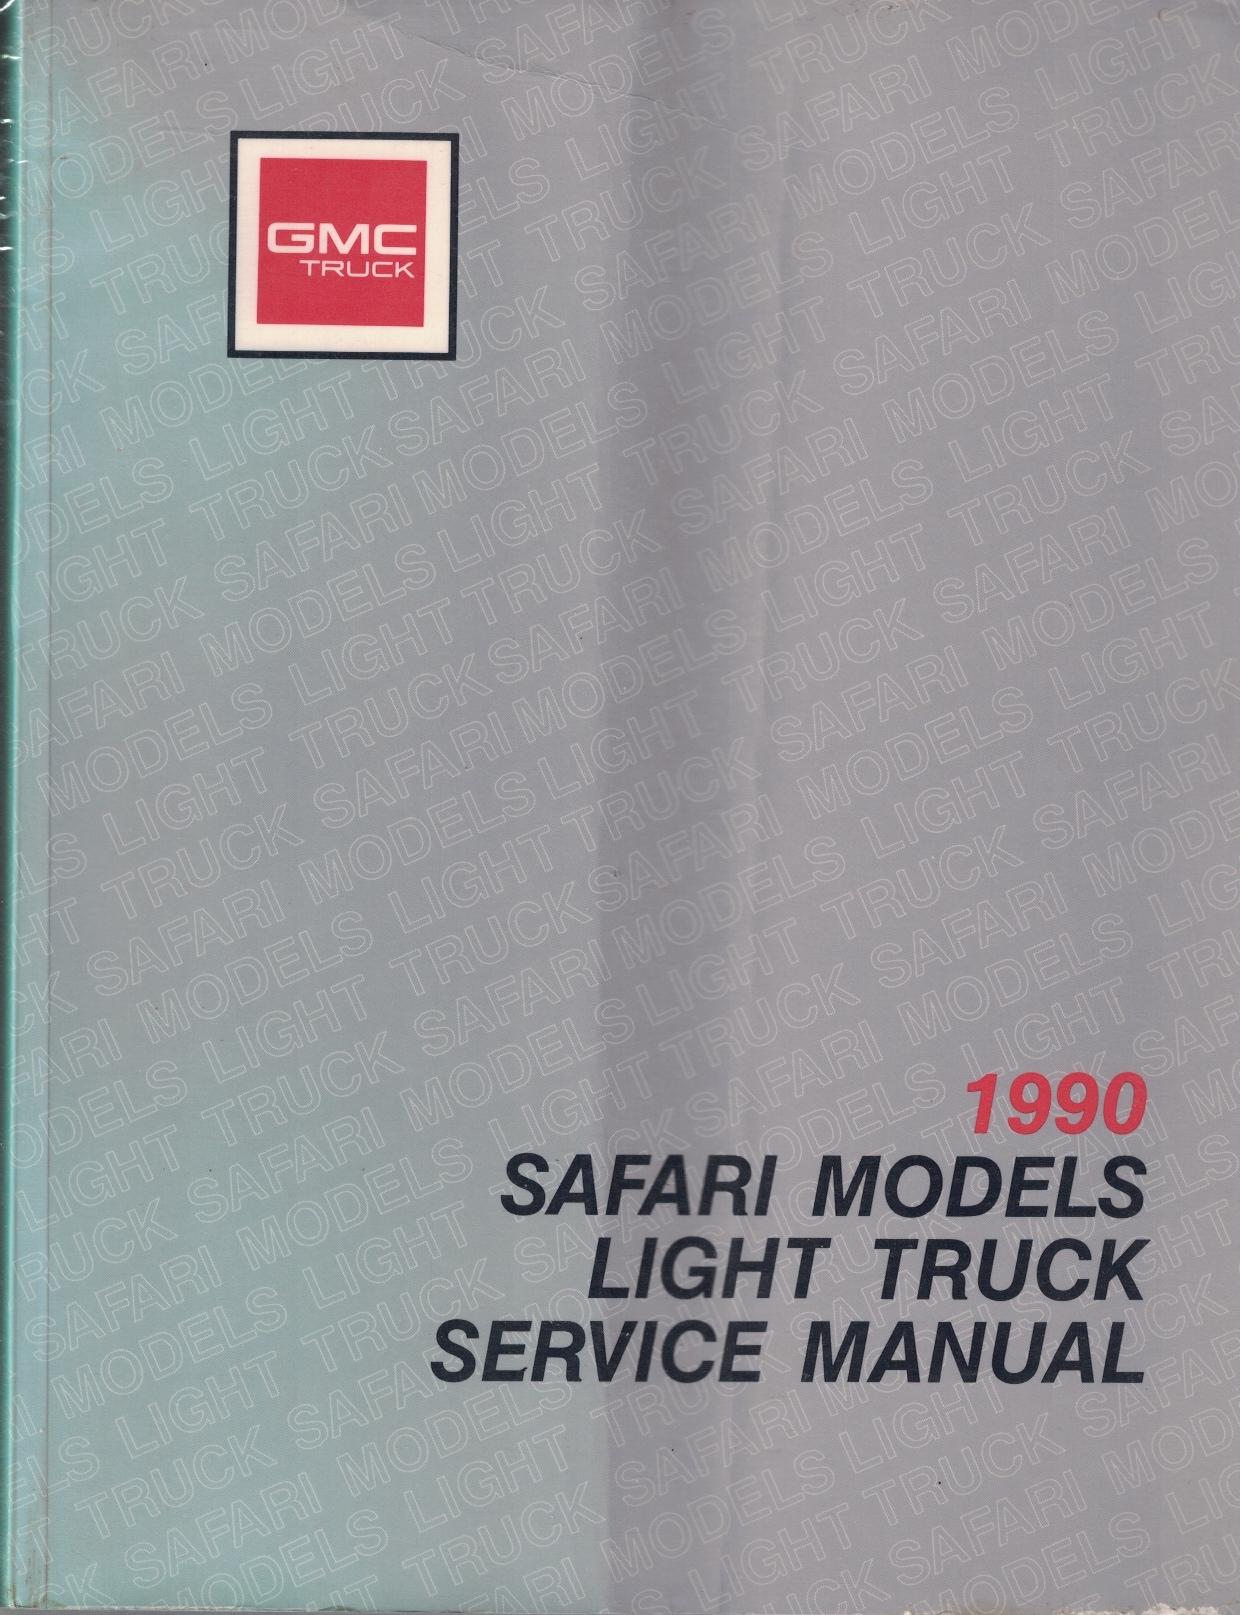 Image for 1990 GMC Truck - Safari Models Light Truck Service Manual